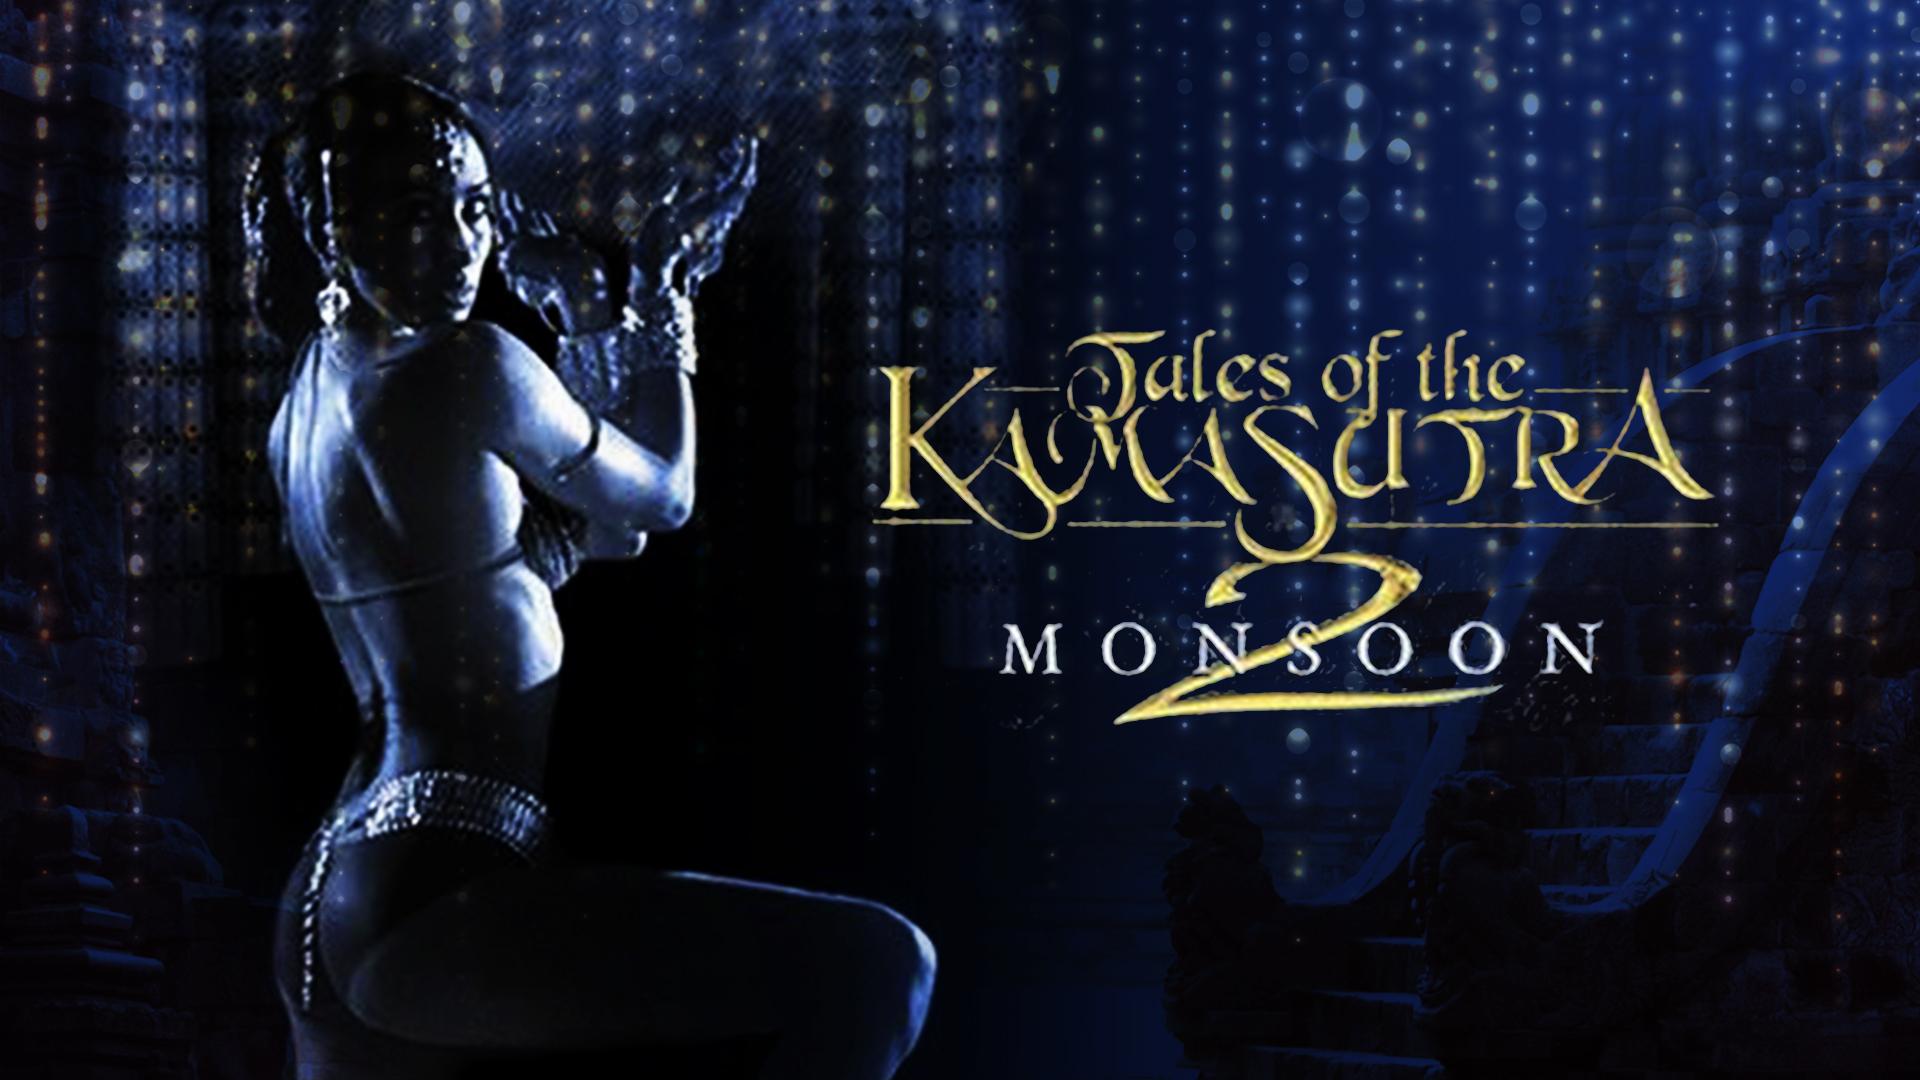 Tales of Kama Sutra II: Monsoon